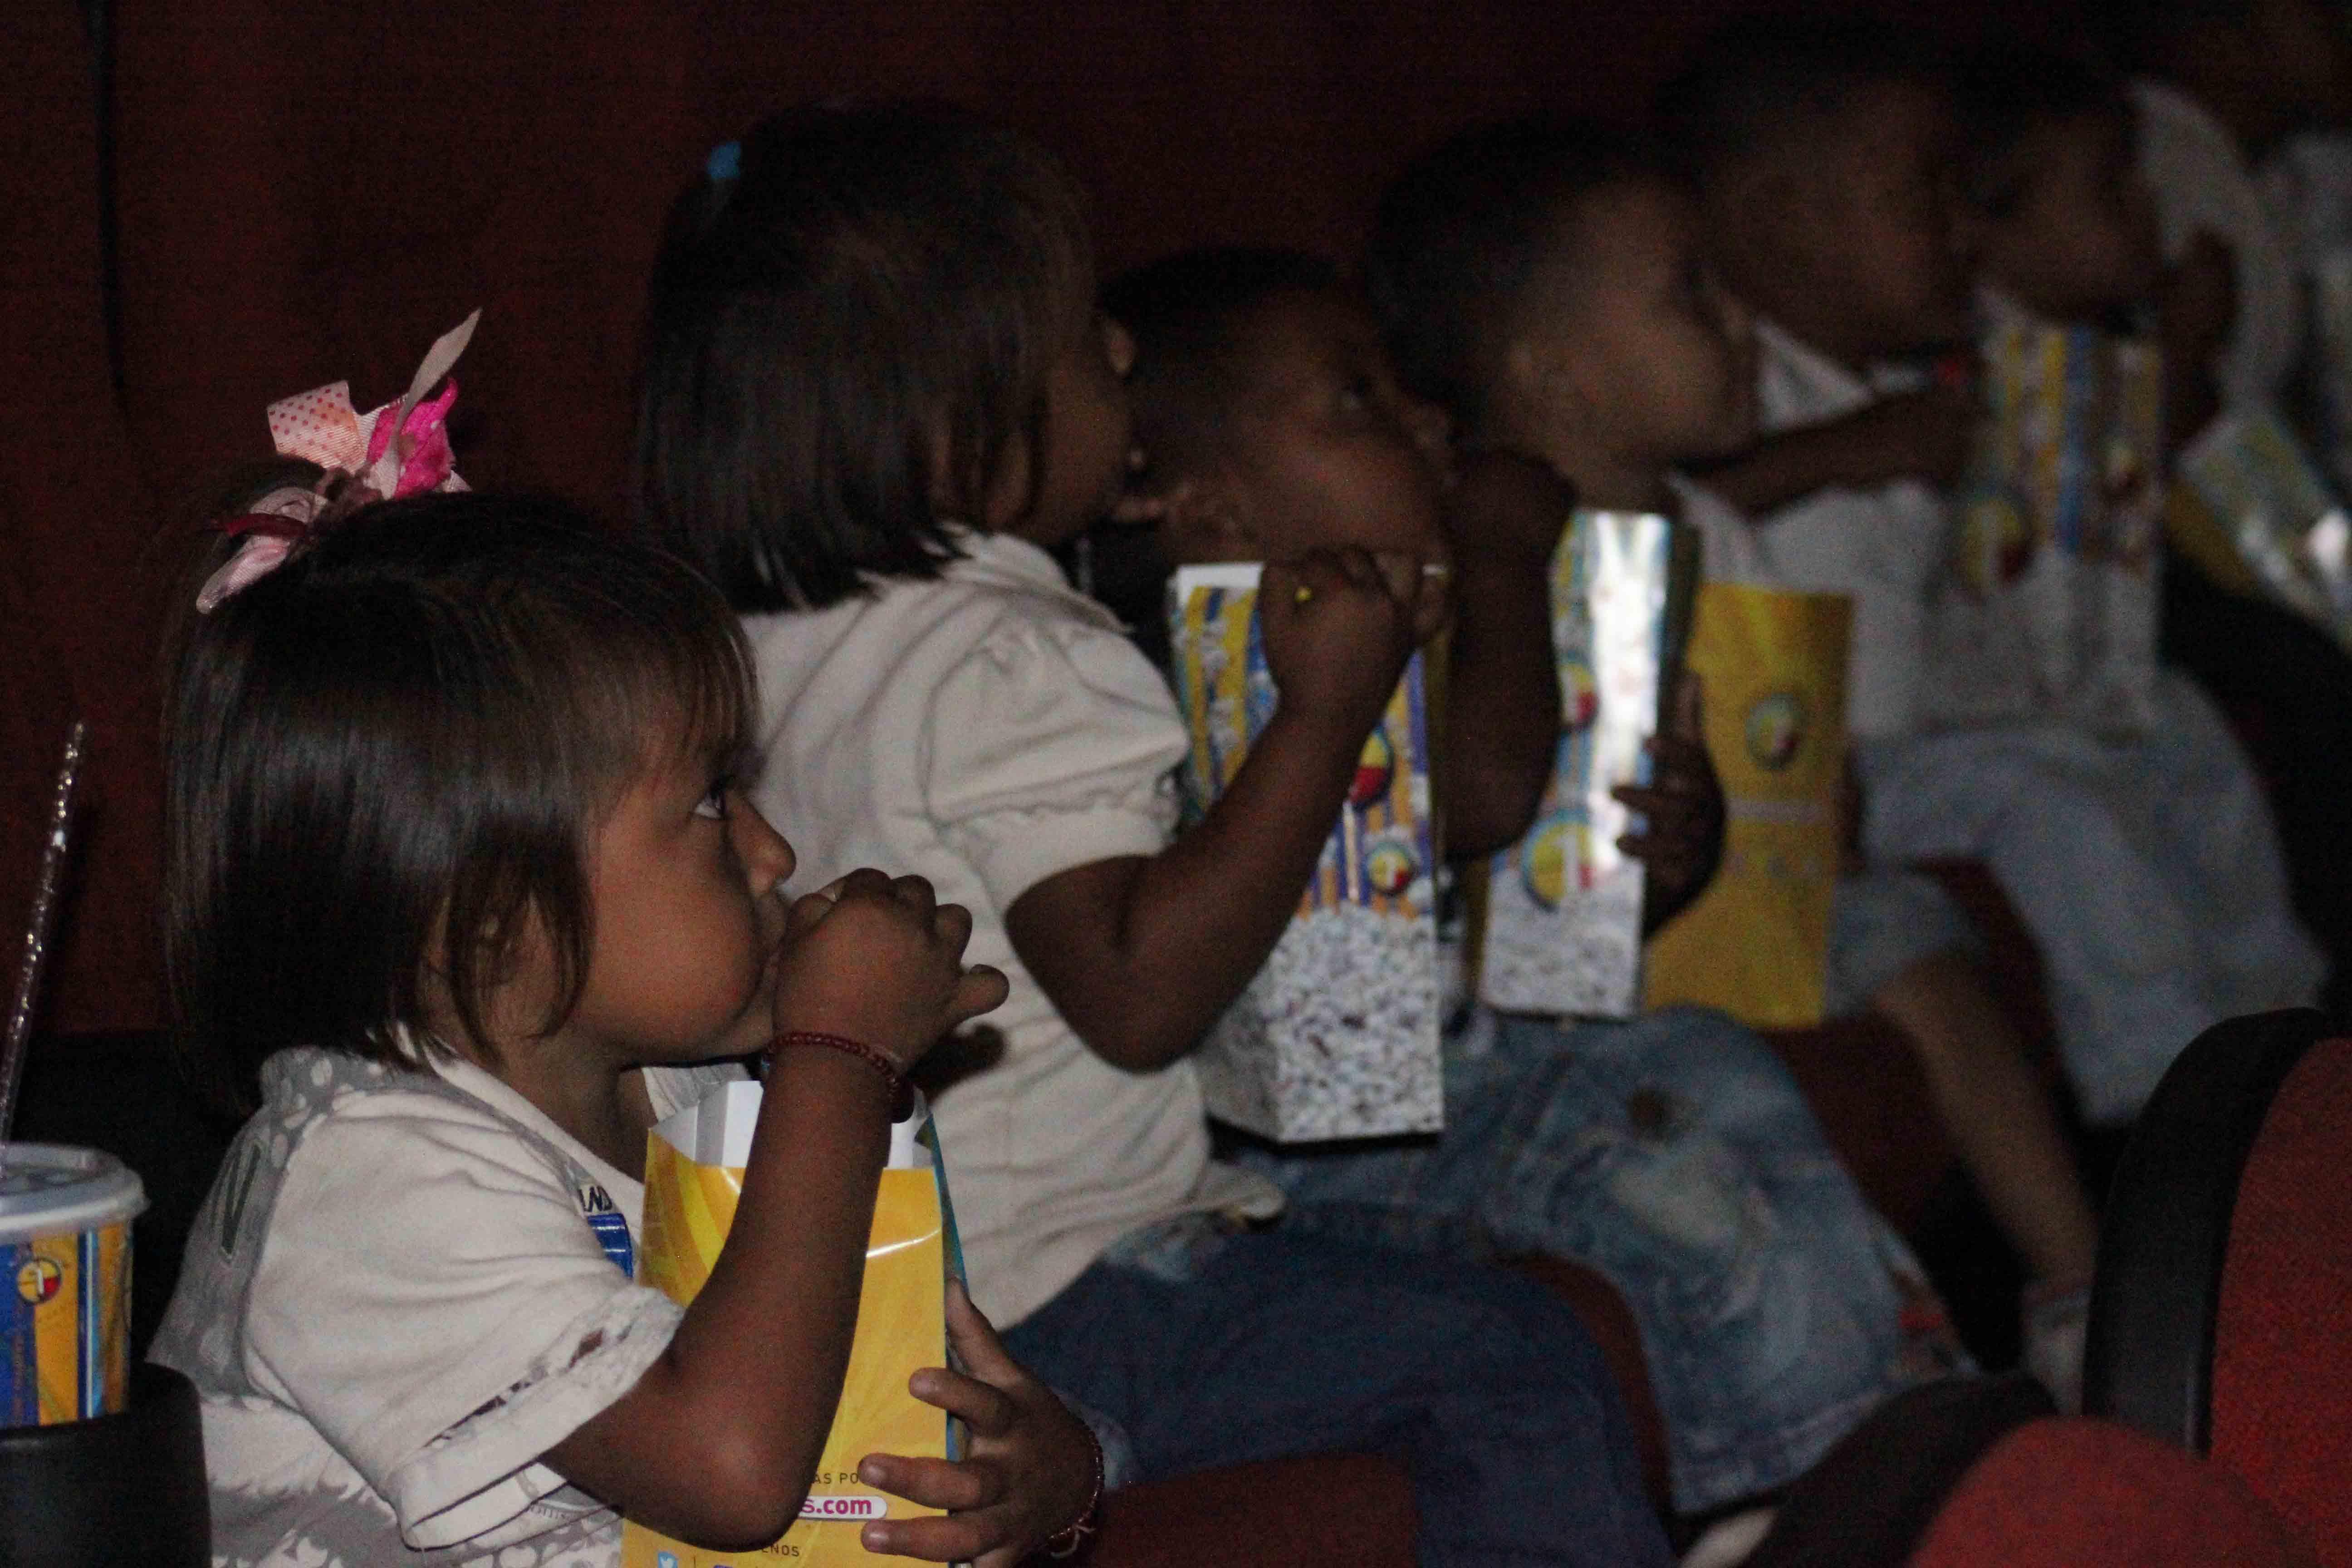 Gmcp garantiza Navidades Felices a través de cine-foro y entrega de juguetes (9)